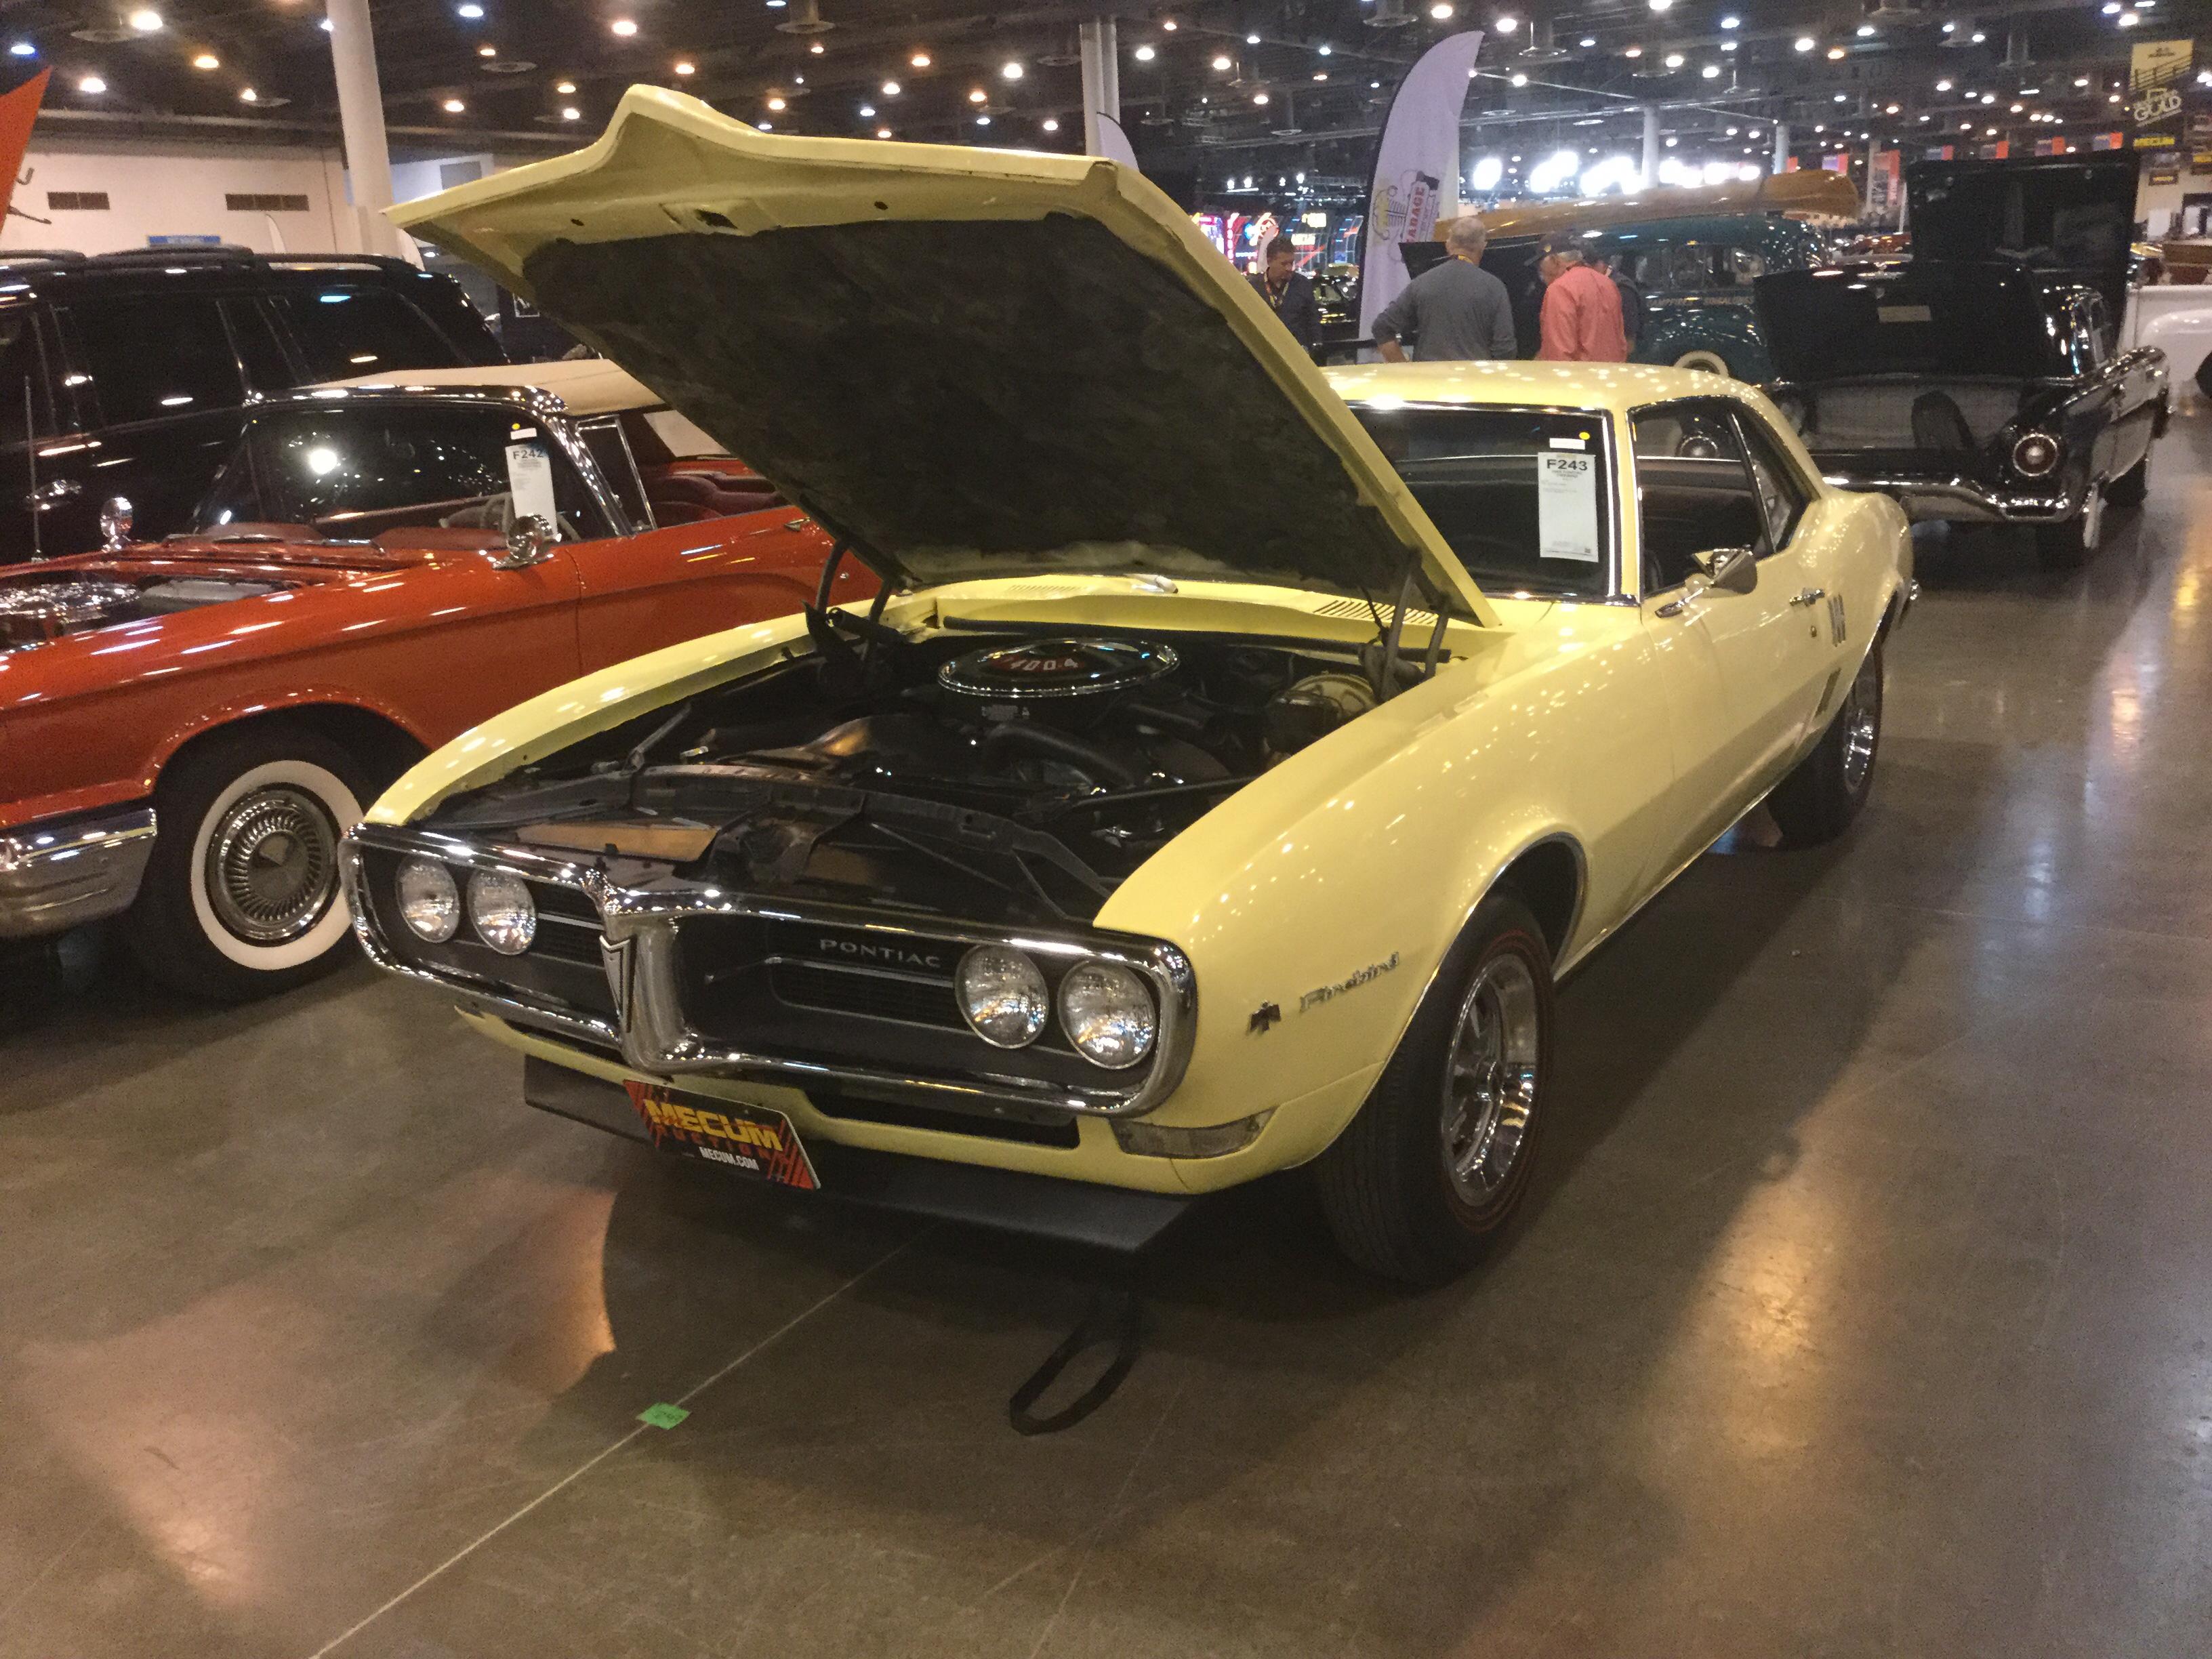 1968 Pontiac Firebird Values | Hagerty Valuation Tool®